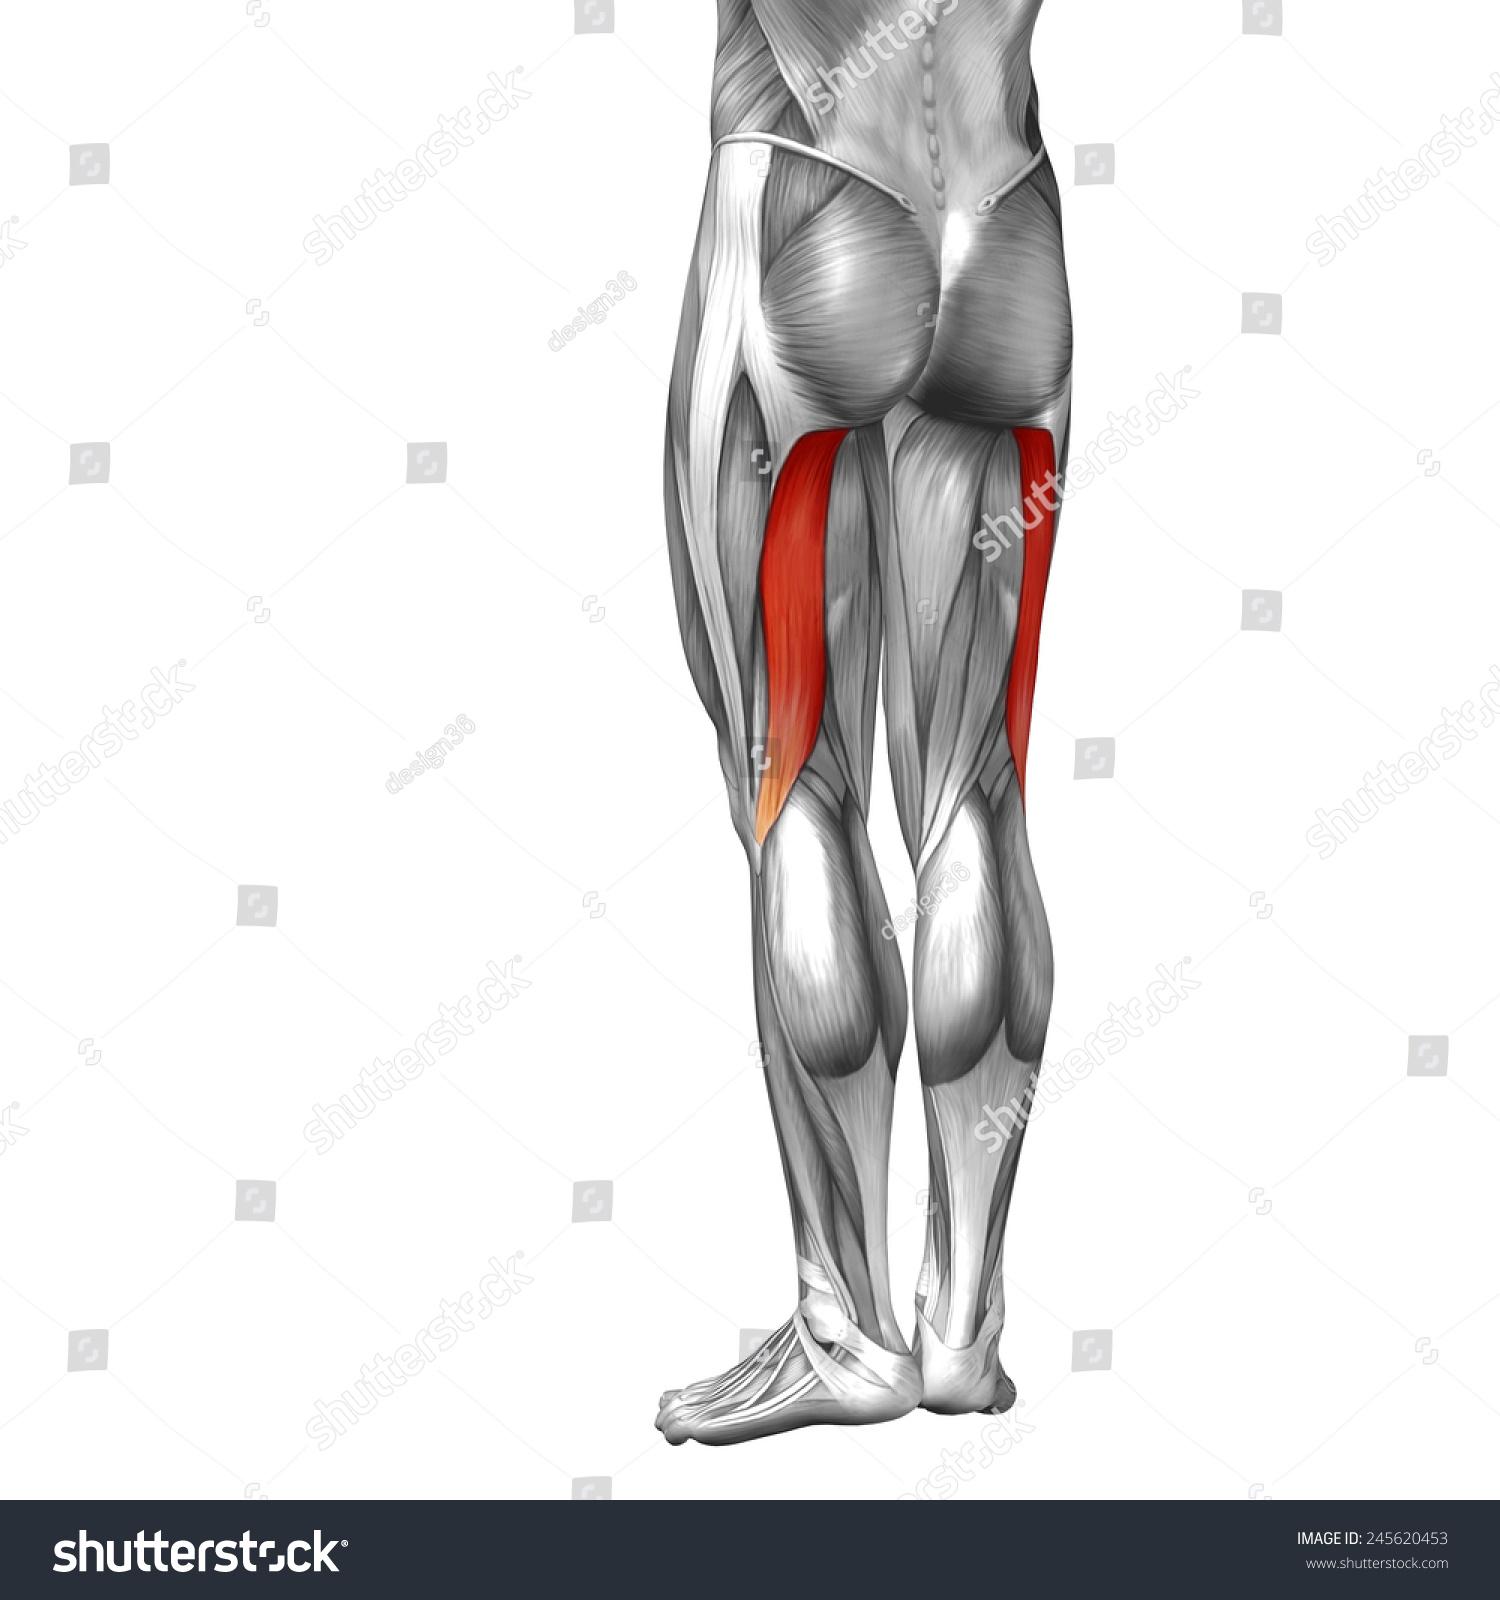 Conceptual 3 D Biceps Femoris Leg Human Stock Illustration 245620453 ...